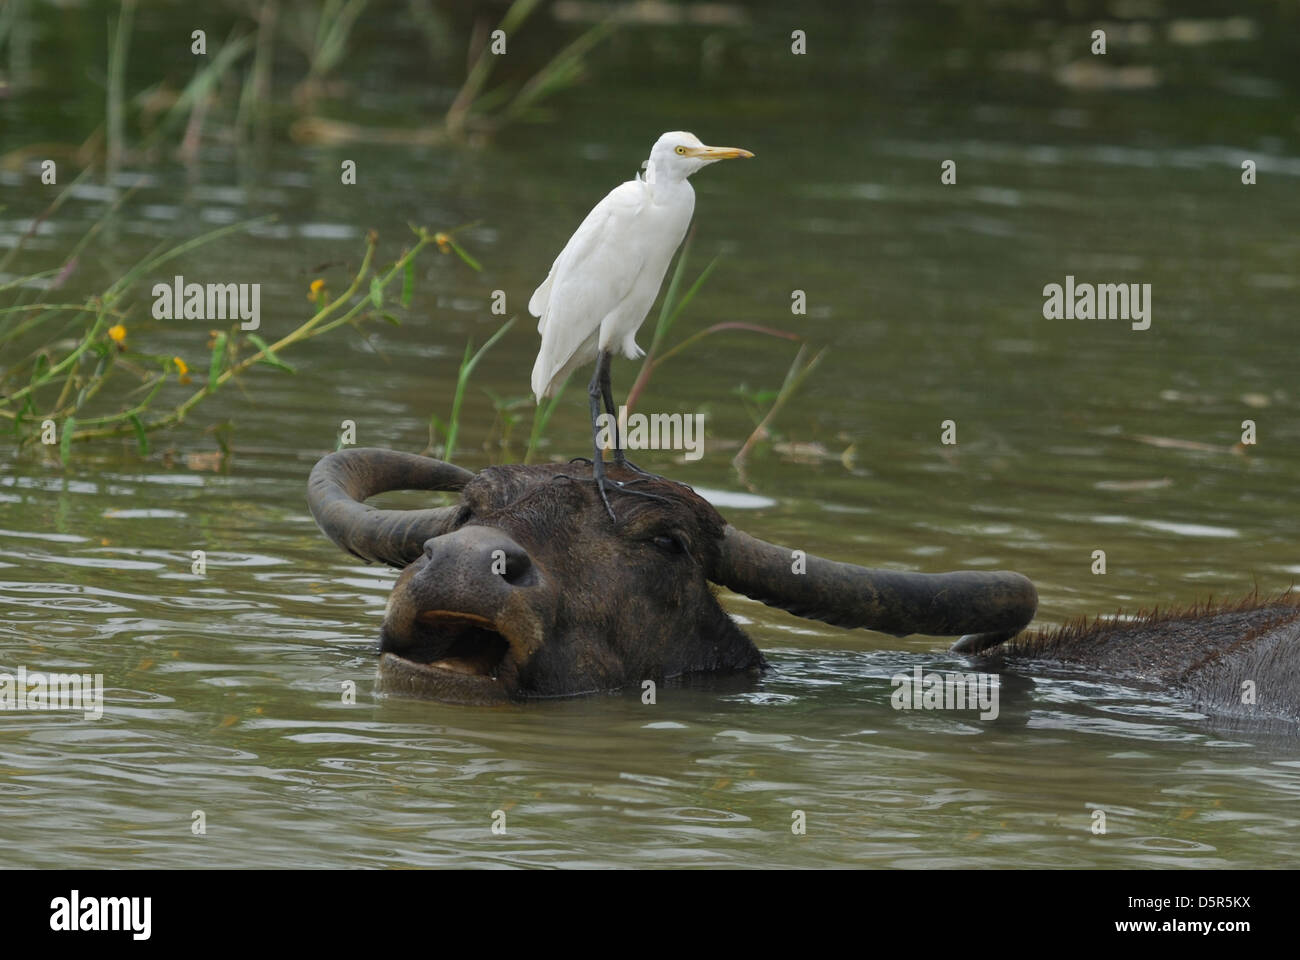 Cattle Egret standing on a Water Buffalo's head, Sri Lanka Stock Photo